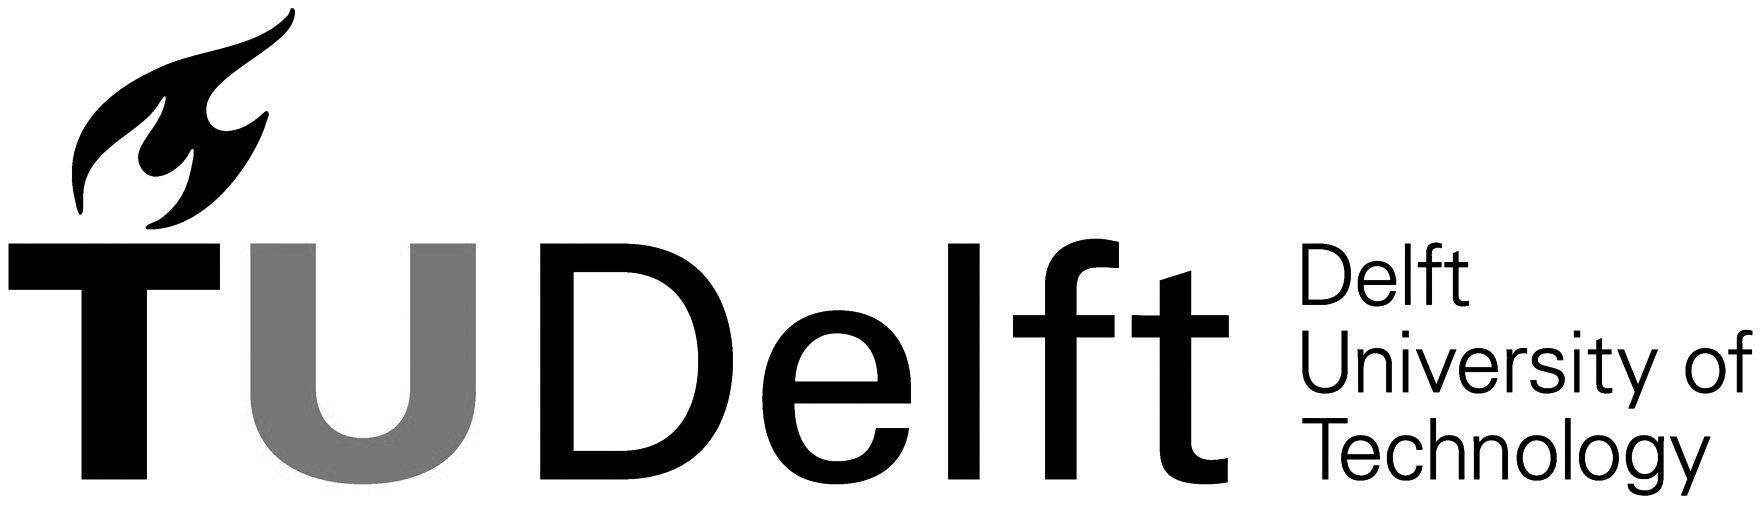 zww_TU.Delft_logo